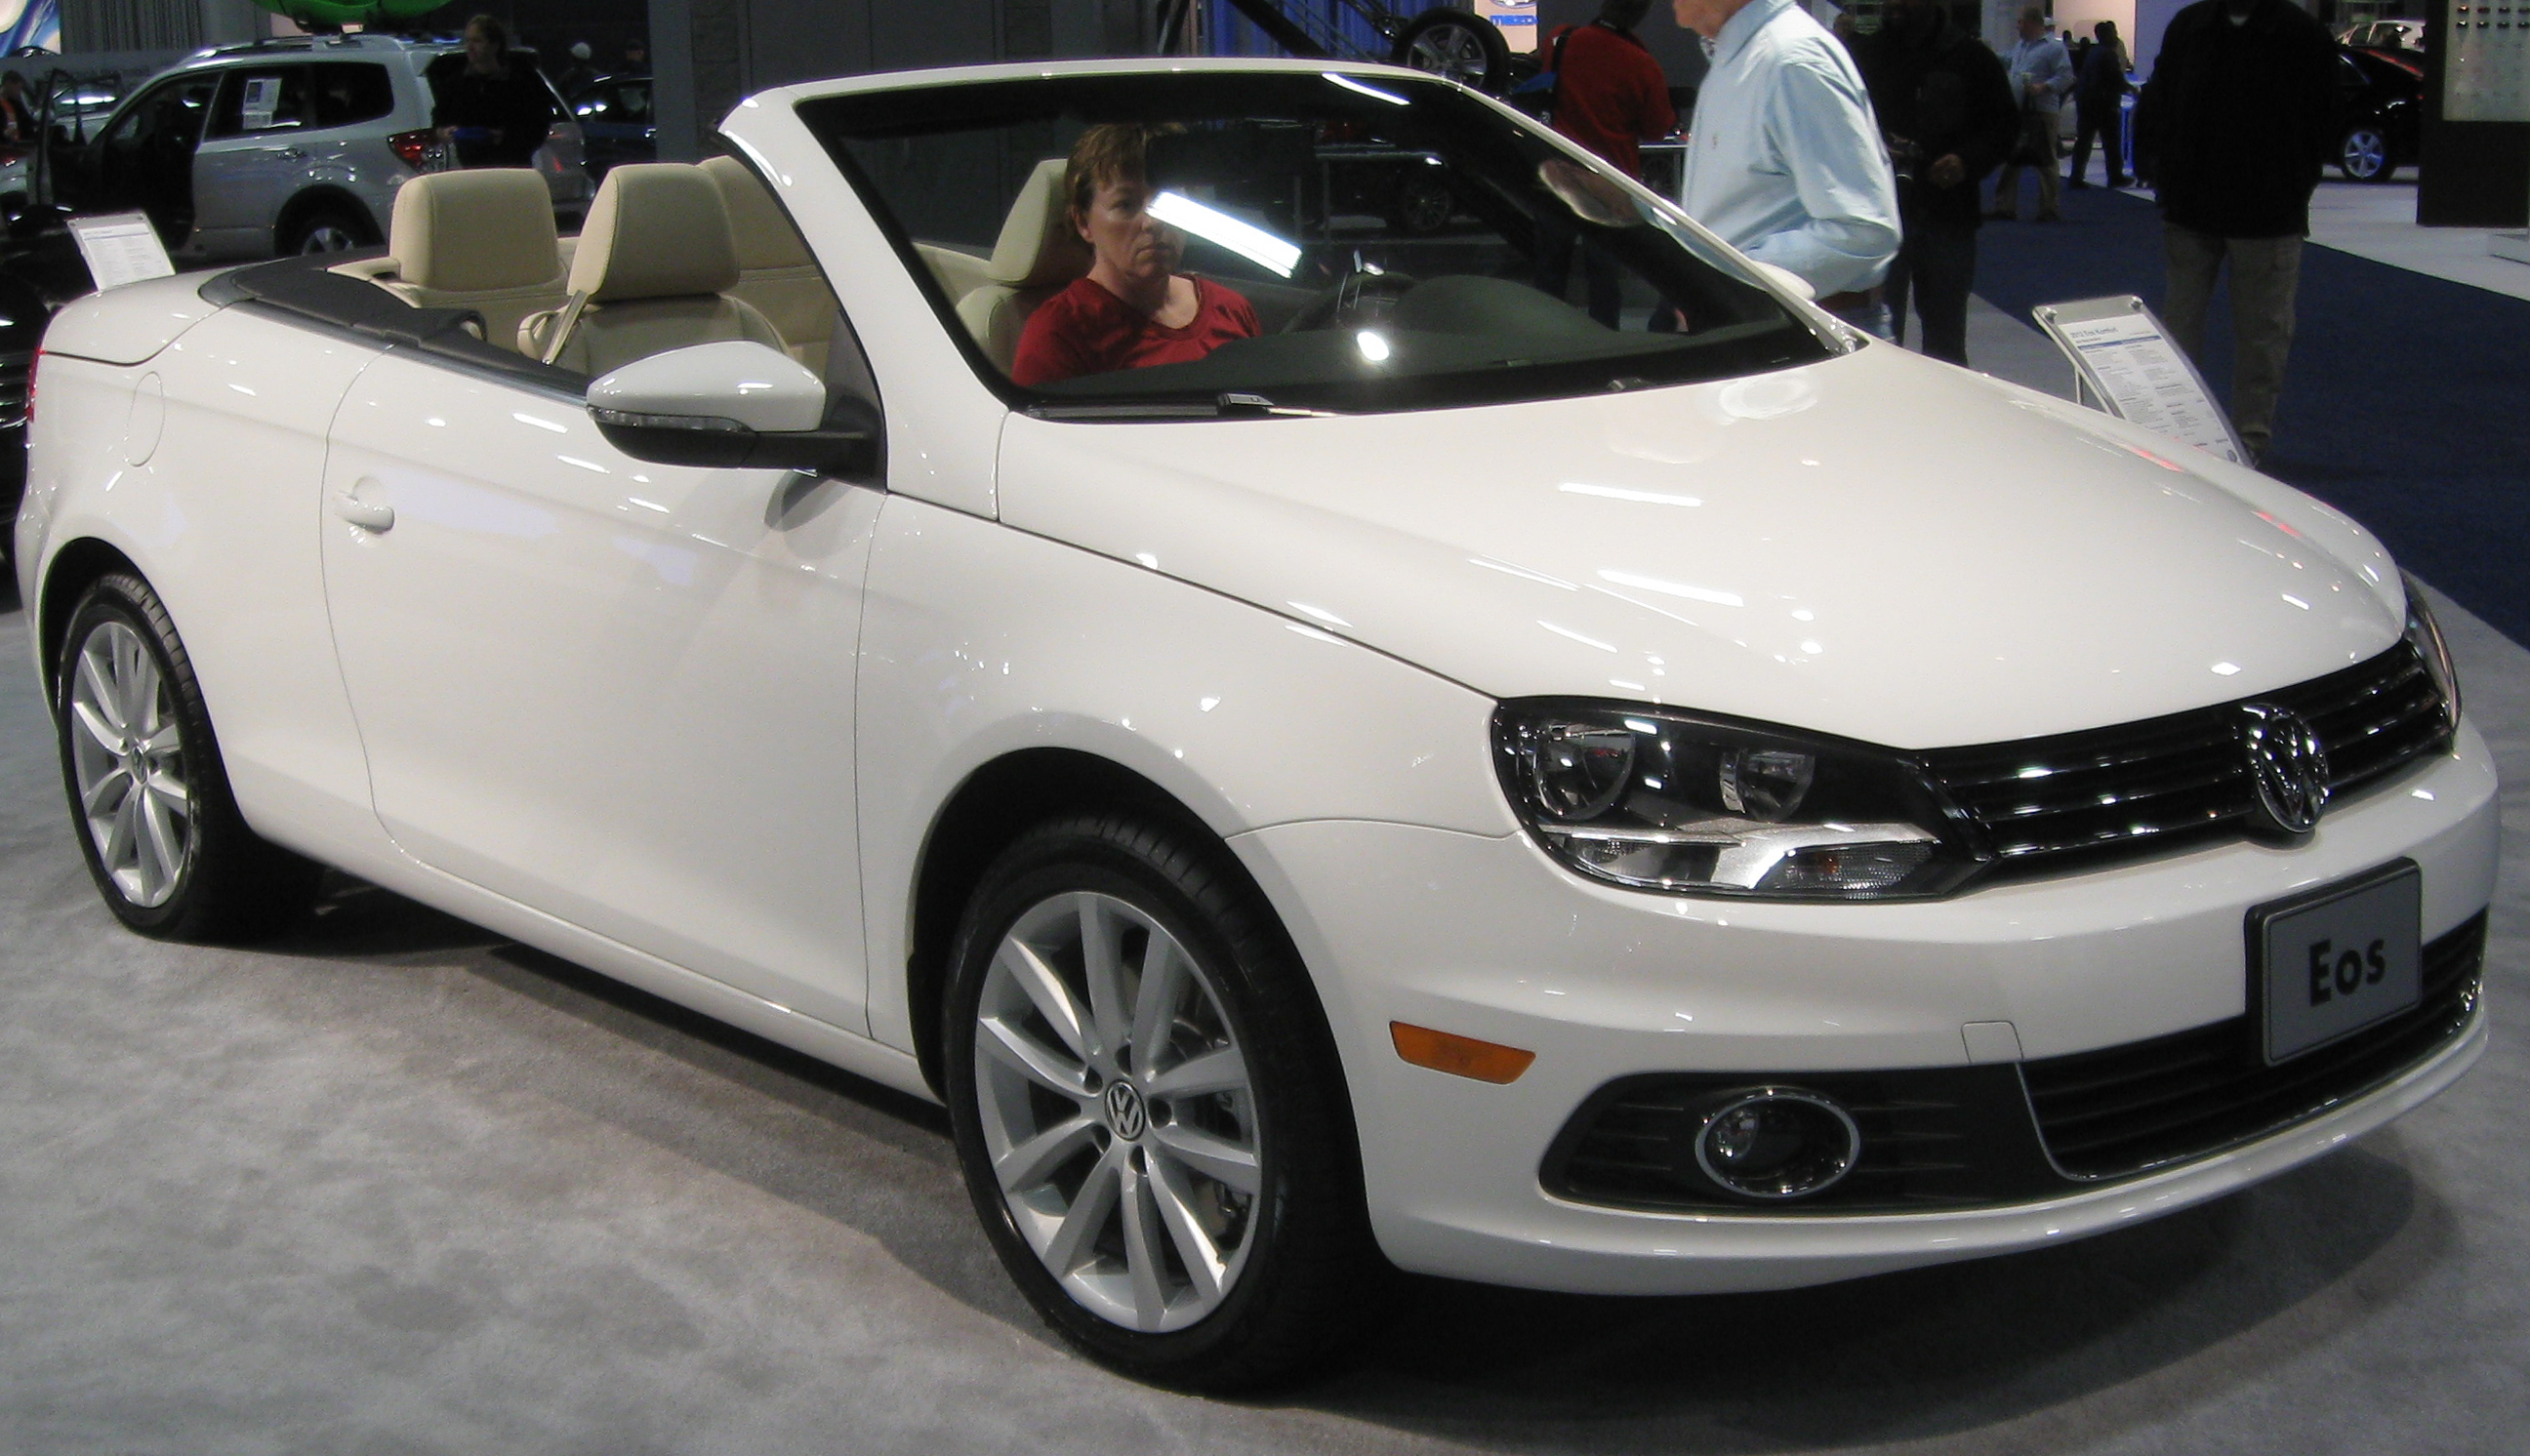 File:2012 Volkswagen Eos -- 2011 DC.jpg - Wikimedia Commons